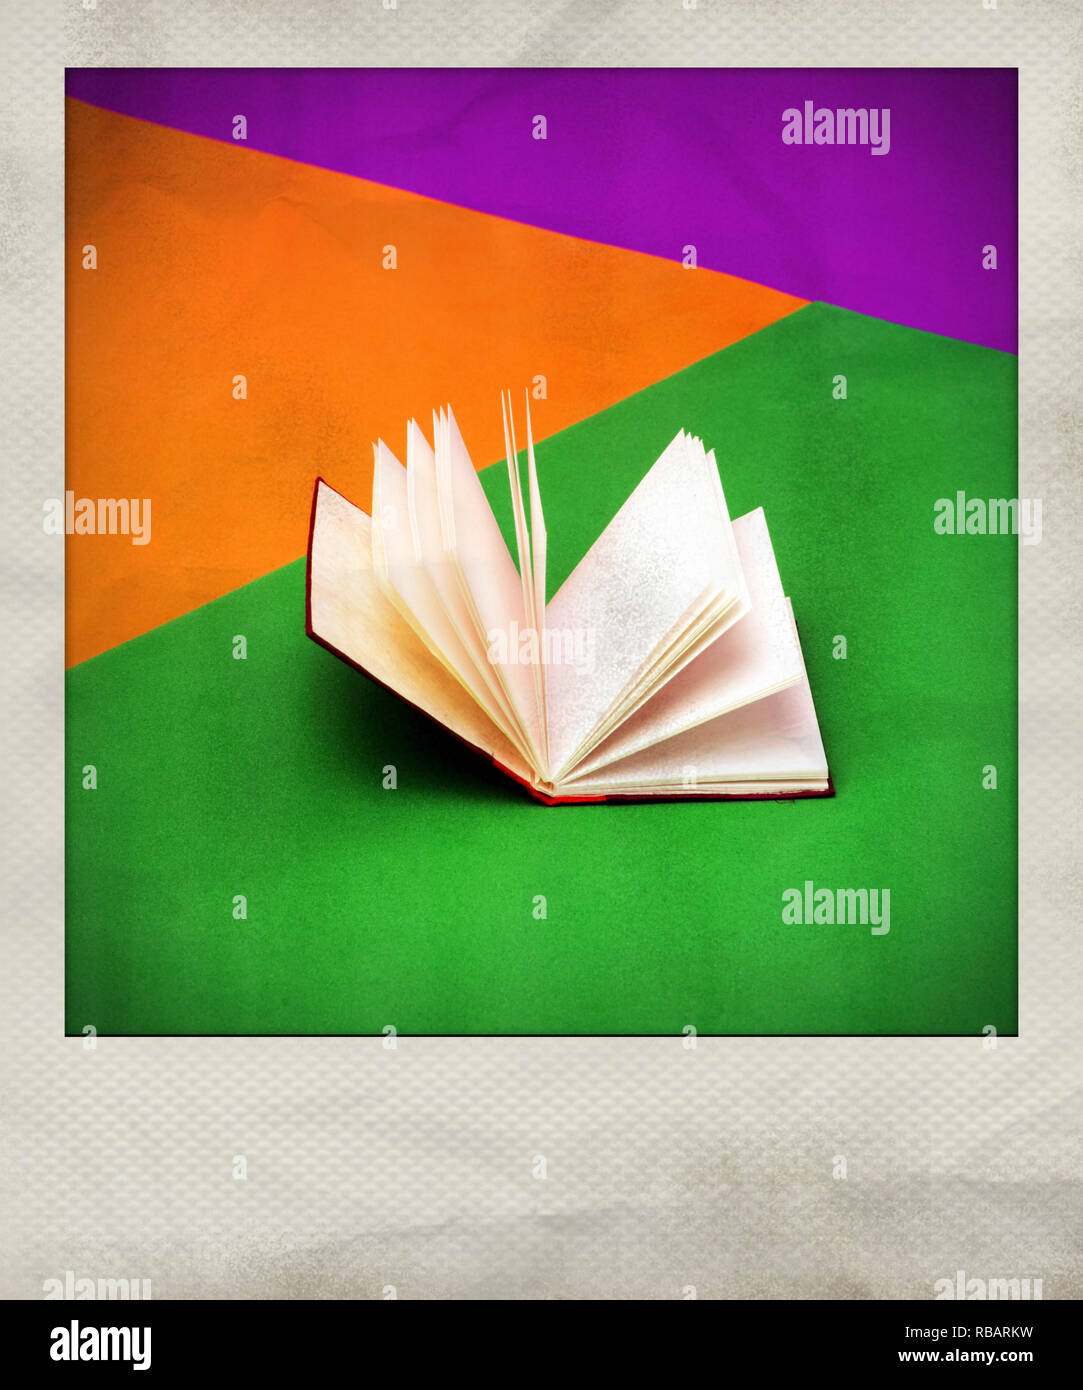 Polaroid effect of book - Stock Image